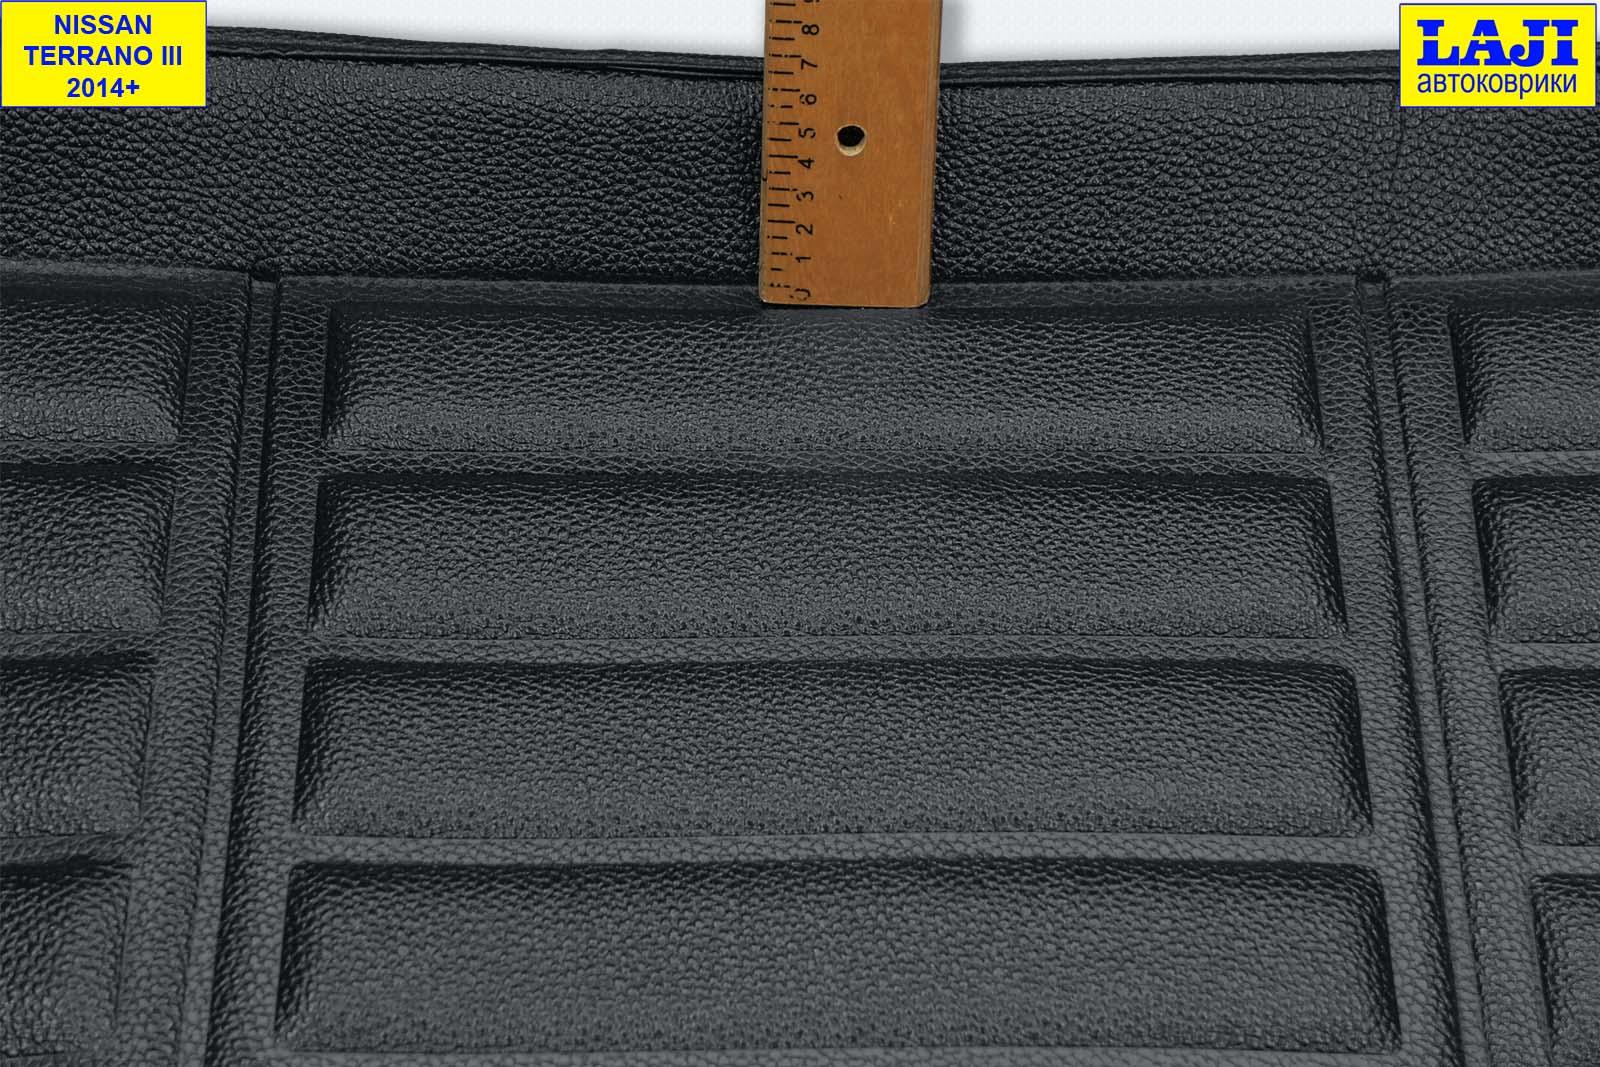 3D коврик в багажник Nissan Terrano D10 2010-н.в. 5